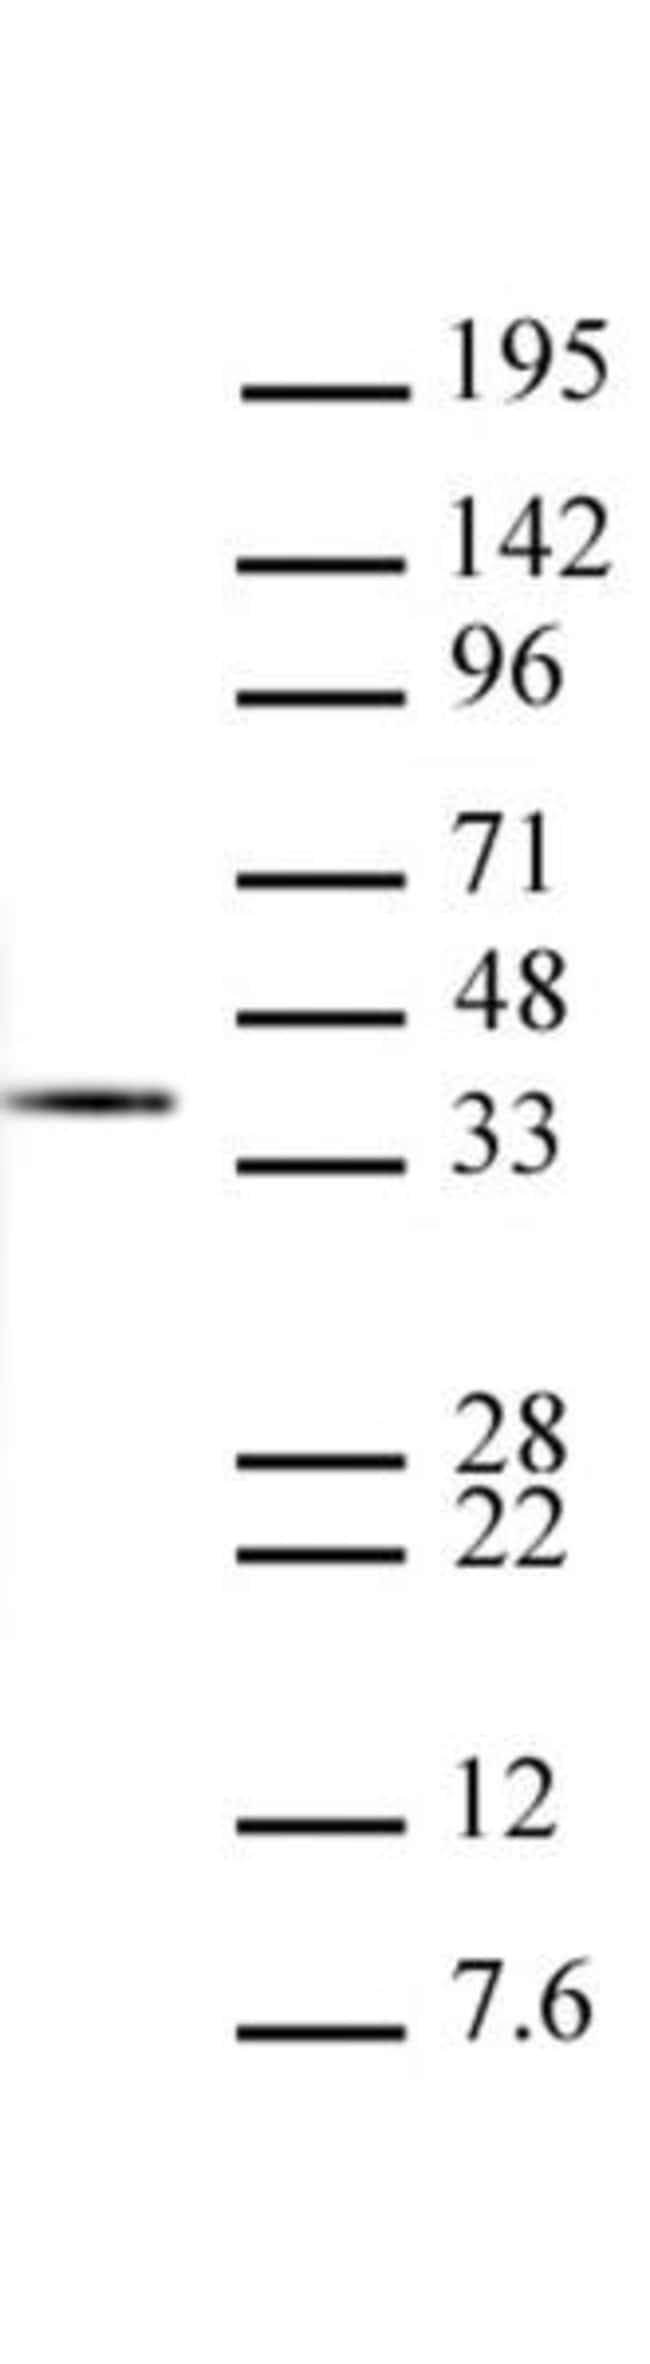 Histone H1 Mouse anti-Drosophila, Clone: 1G6-E3, Active Motif:Antibodies:Primary